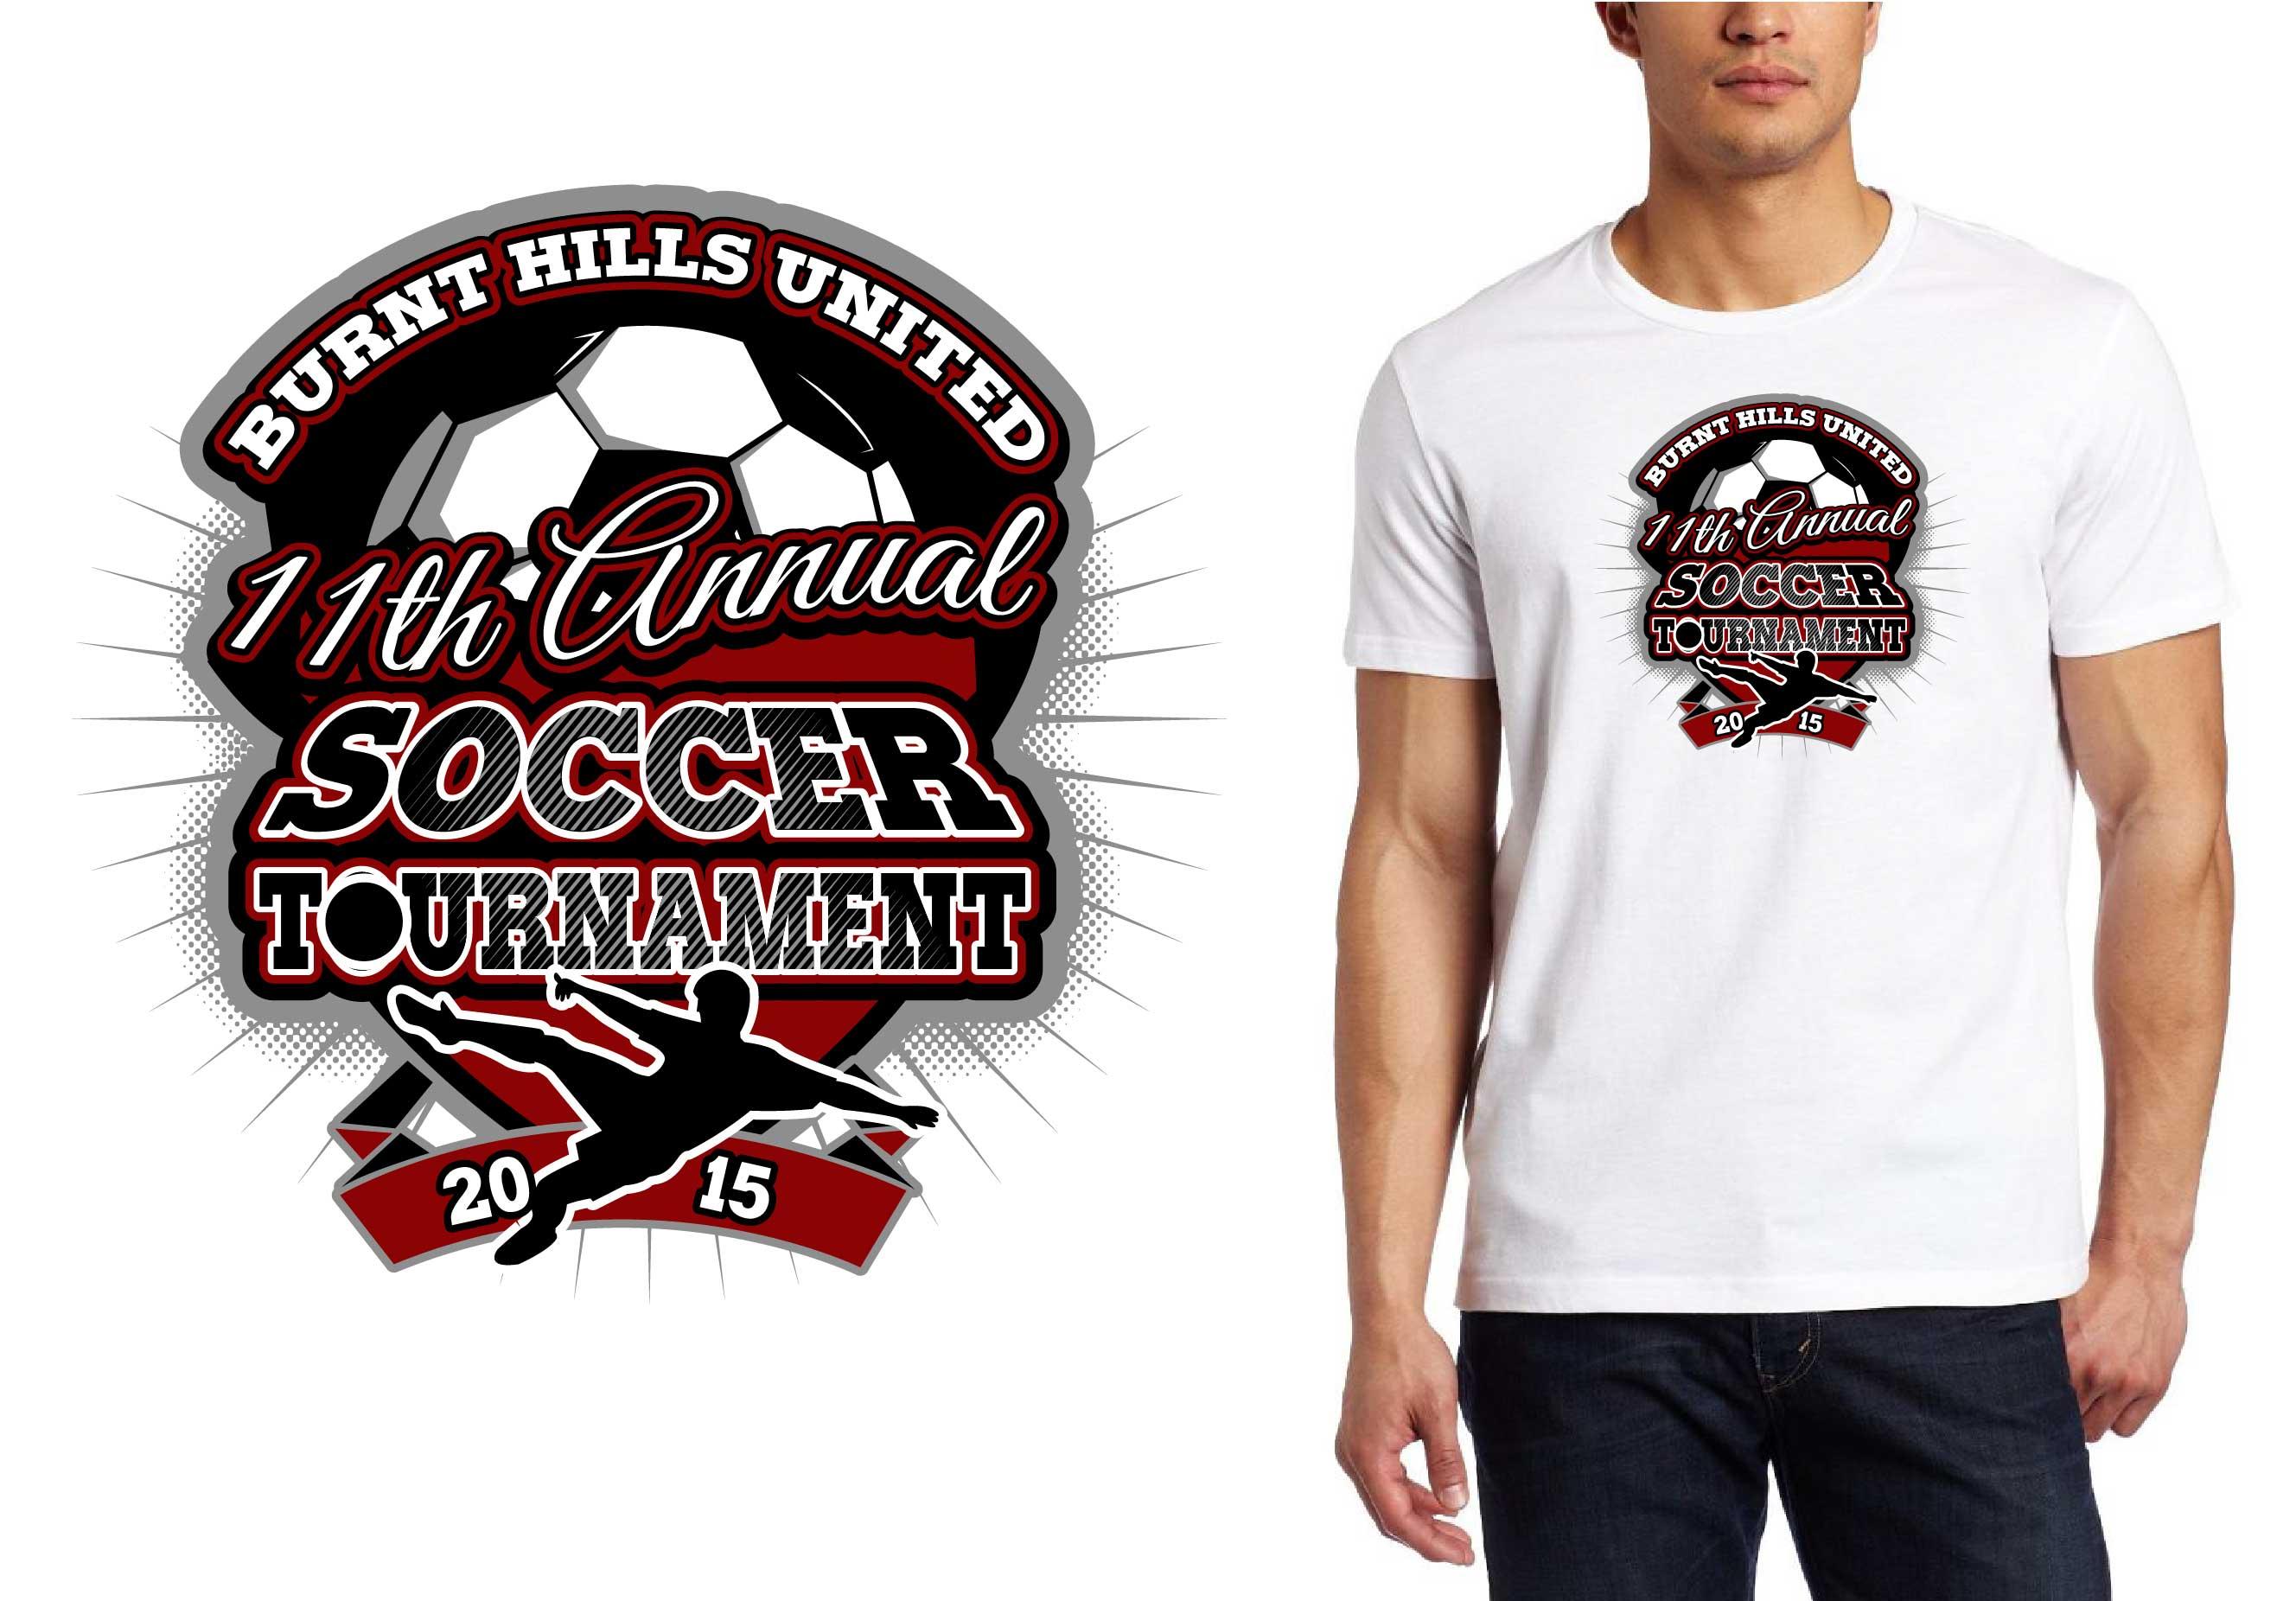 2656x1852 Best T Shirt Vector Logo Design For 2015 Burnt Hills United 11th